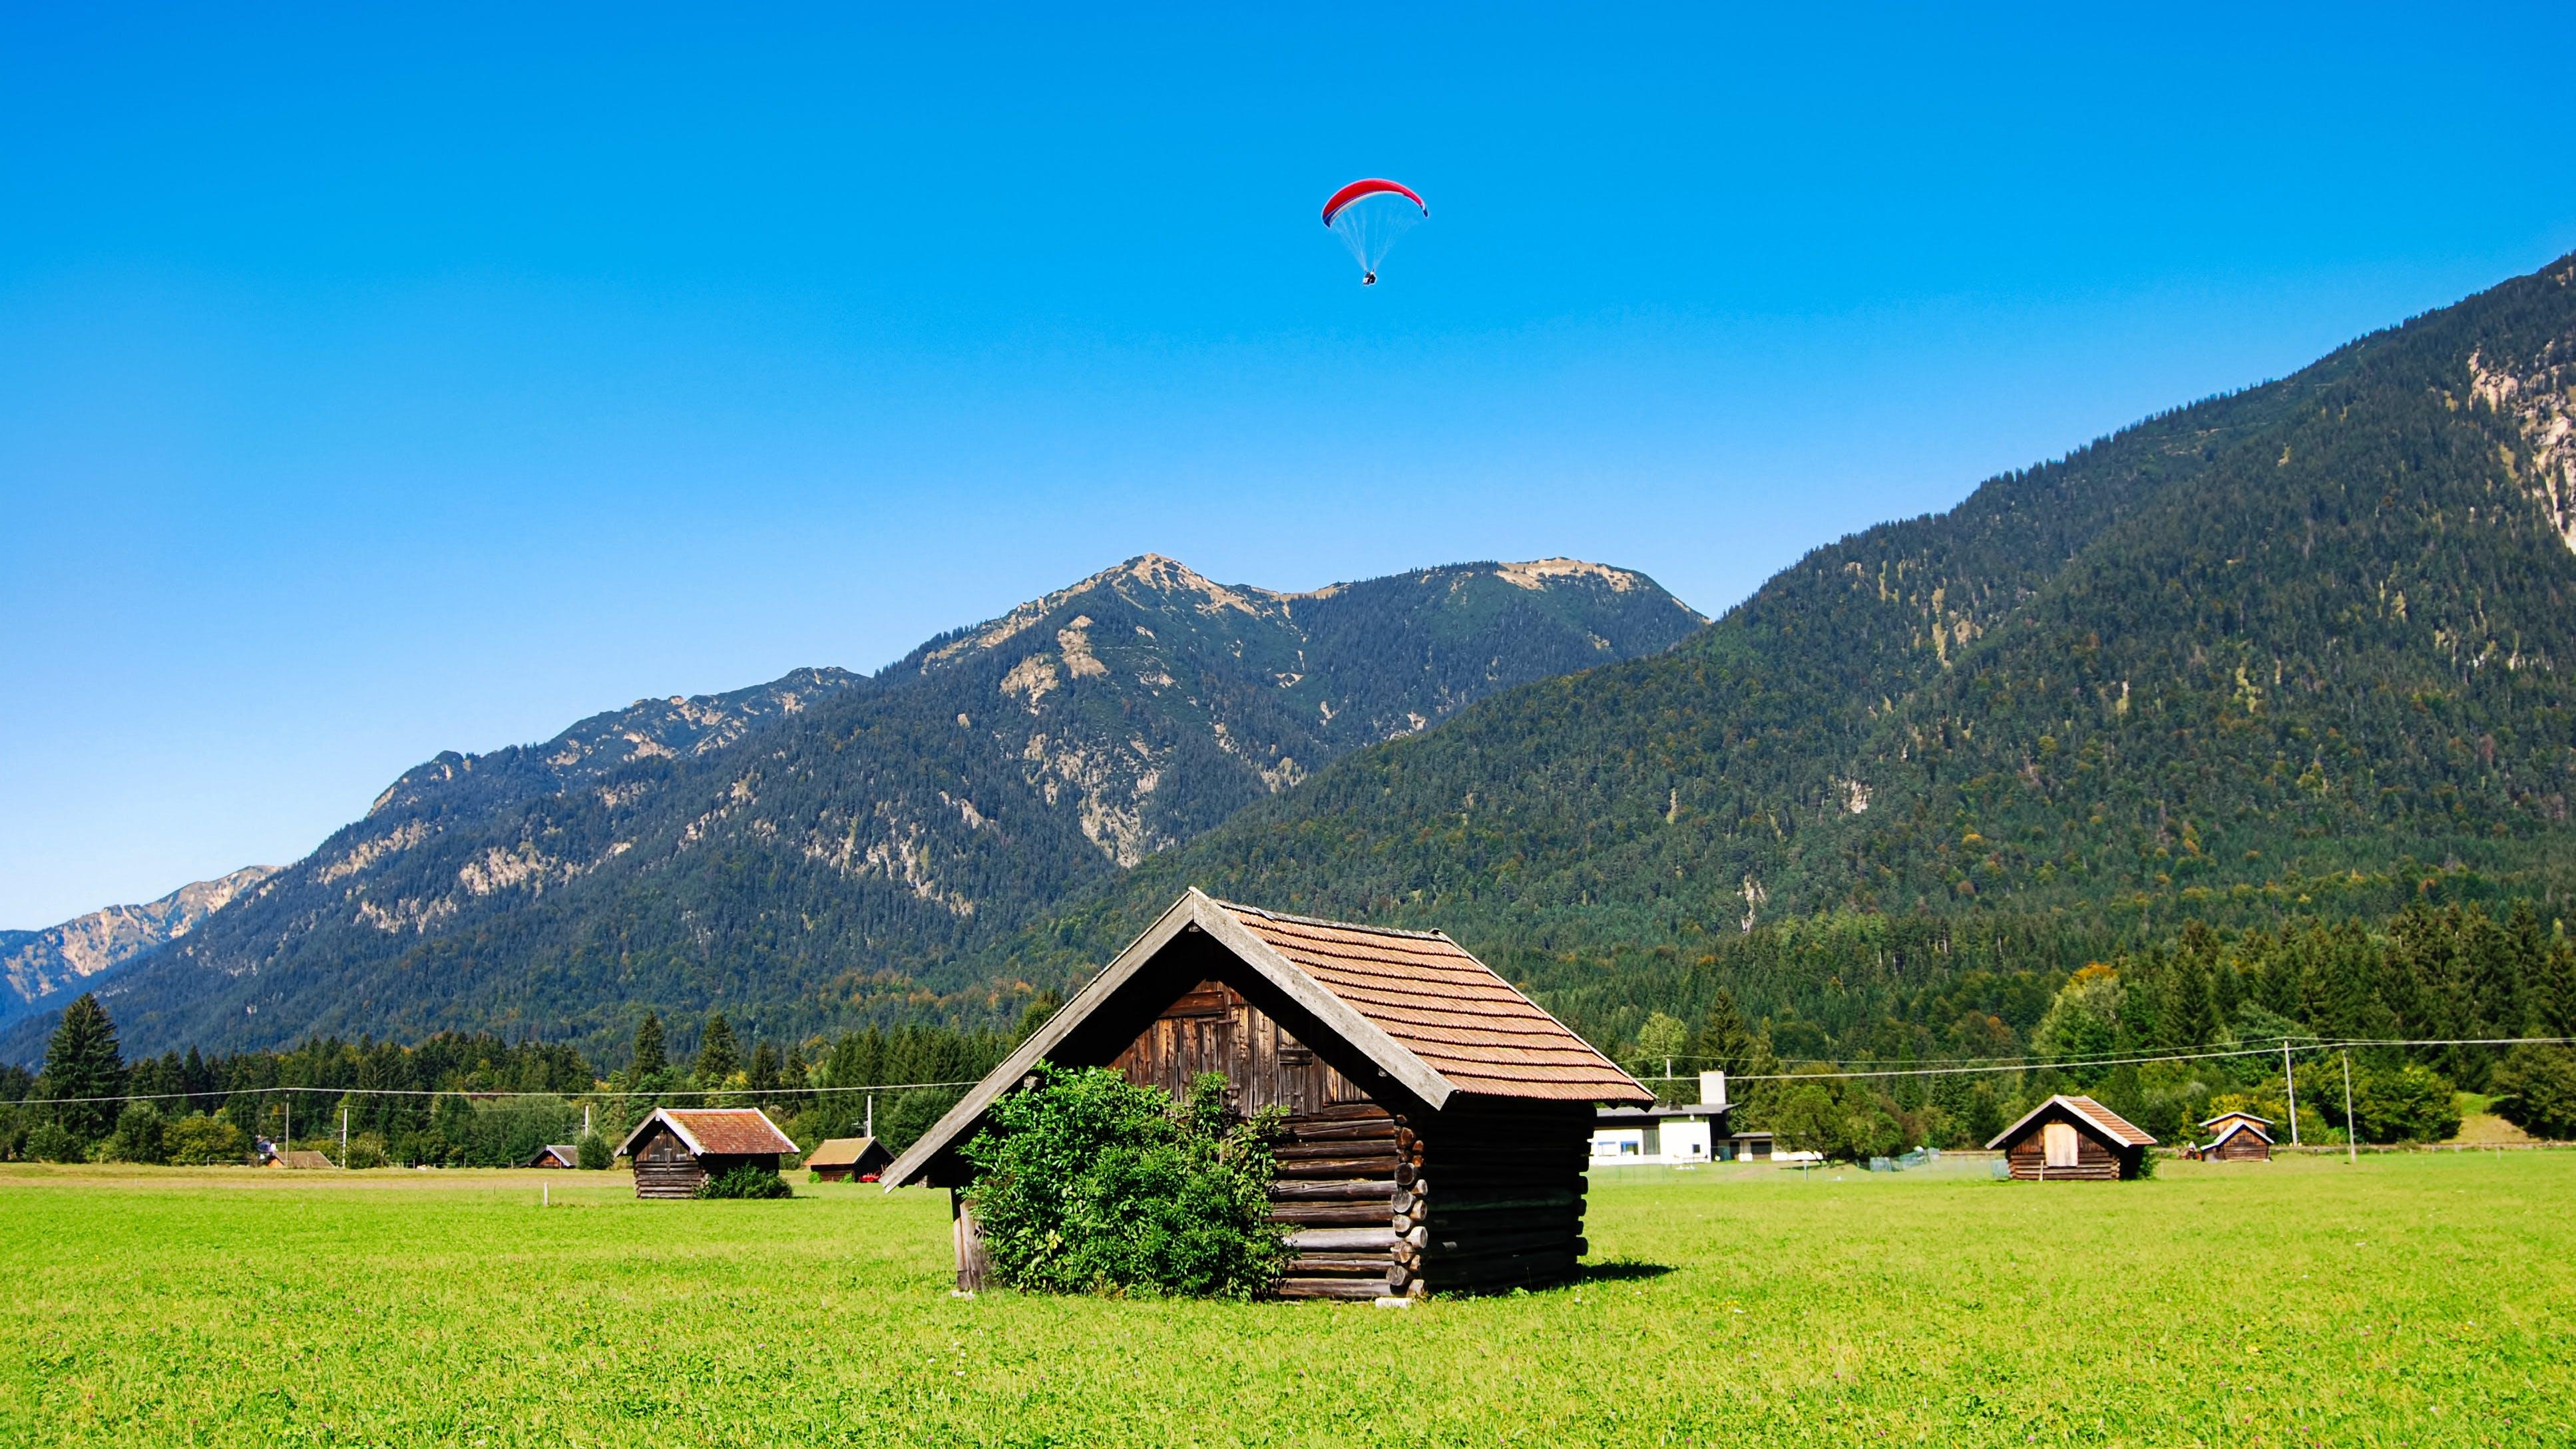 Brown Wooden House on Grass Field Near Mountain